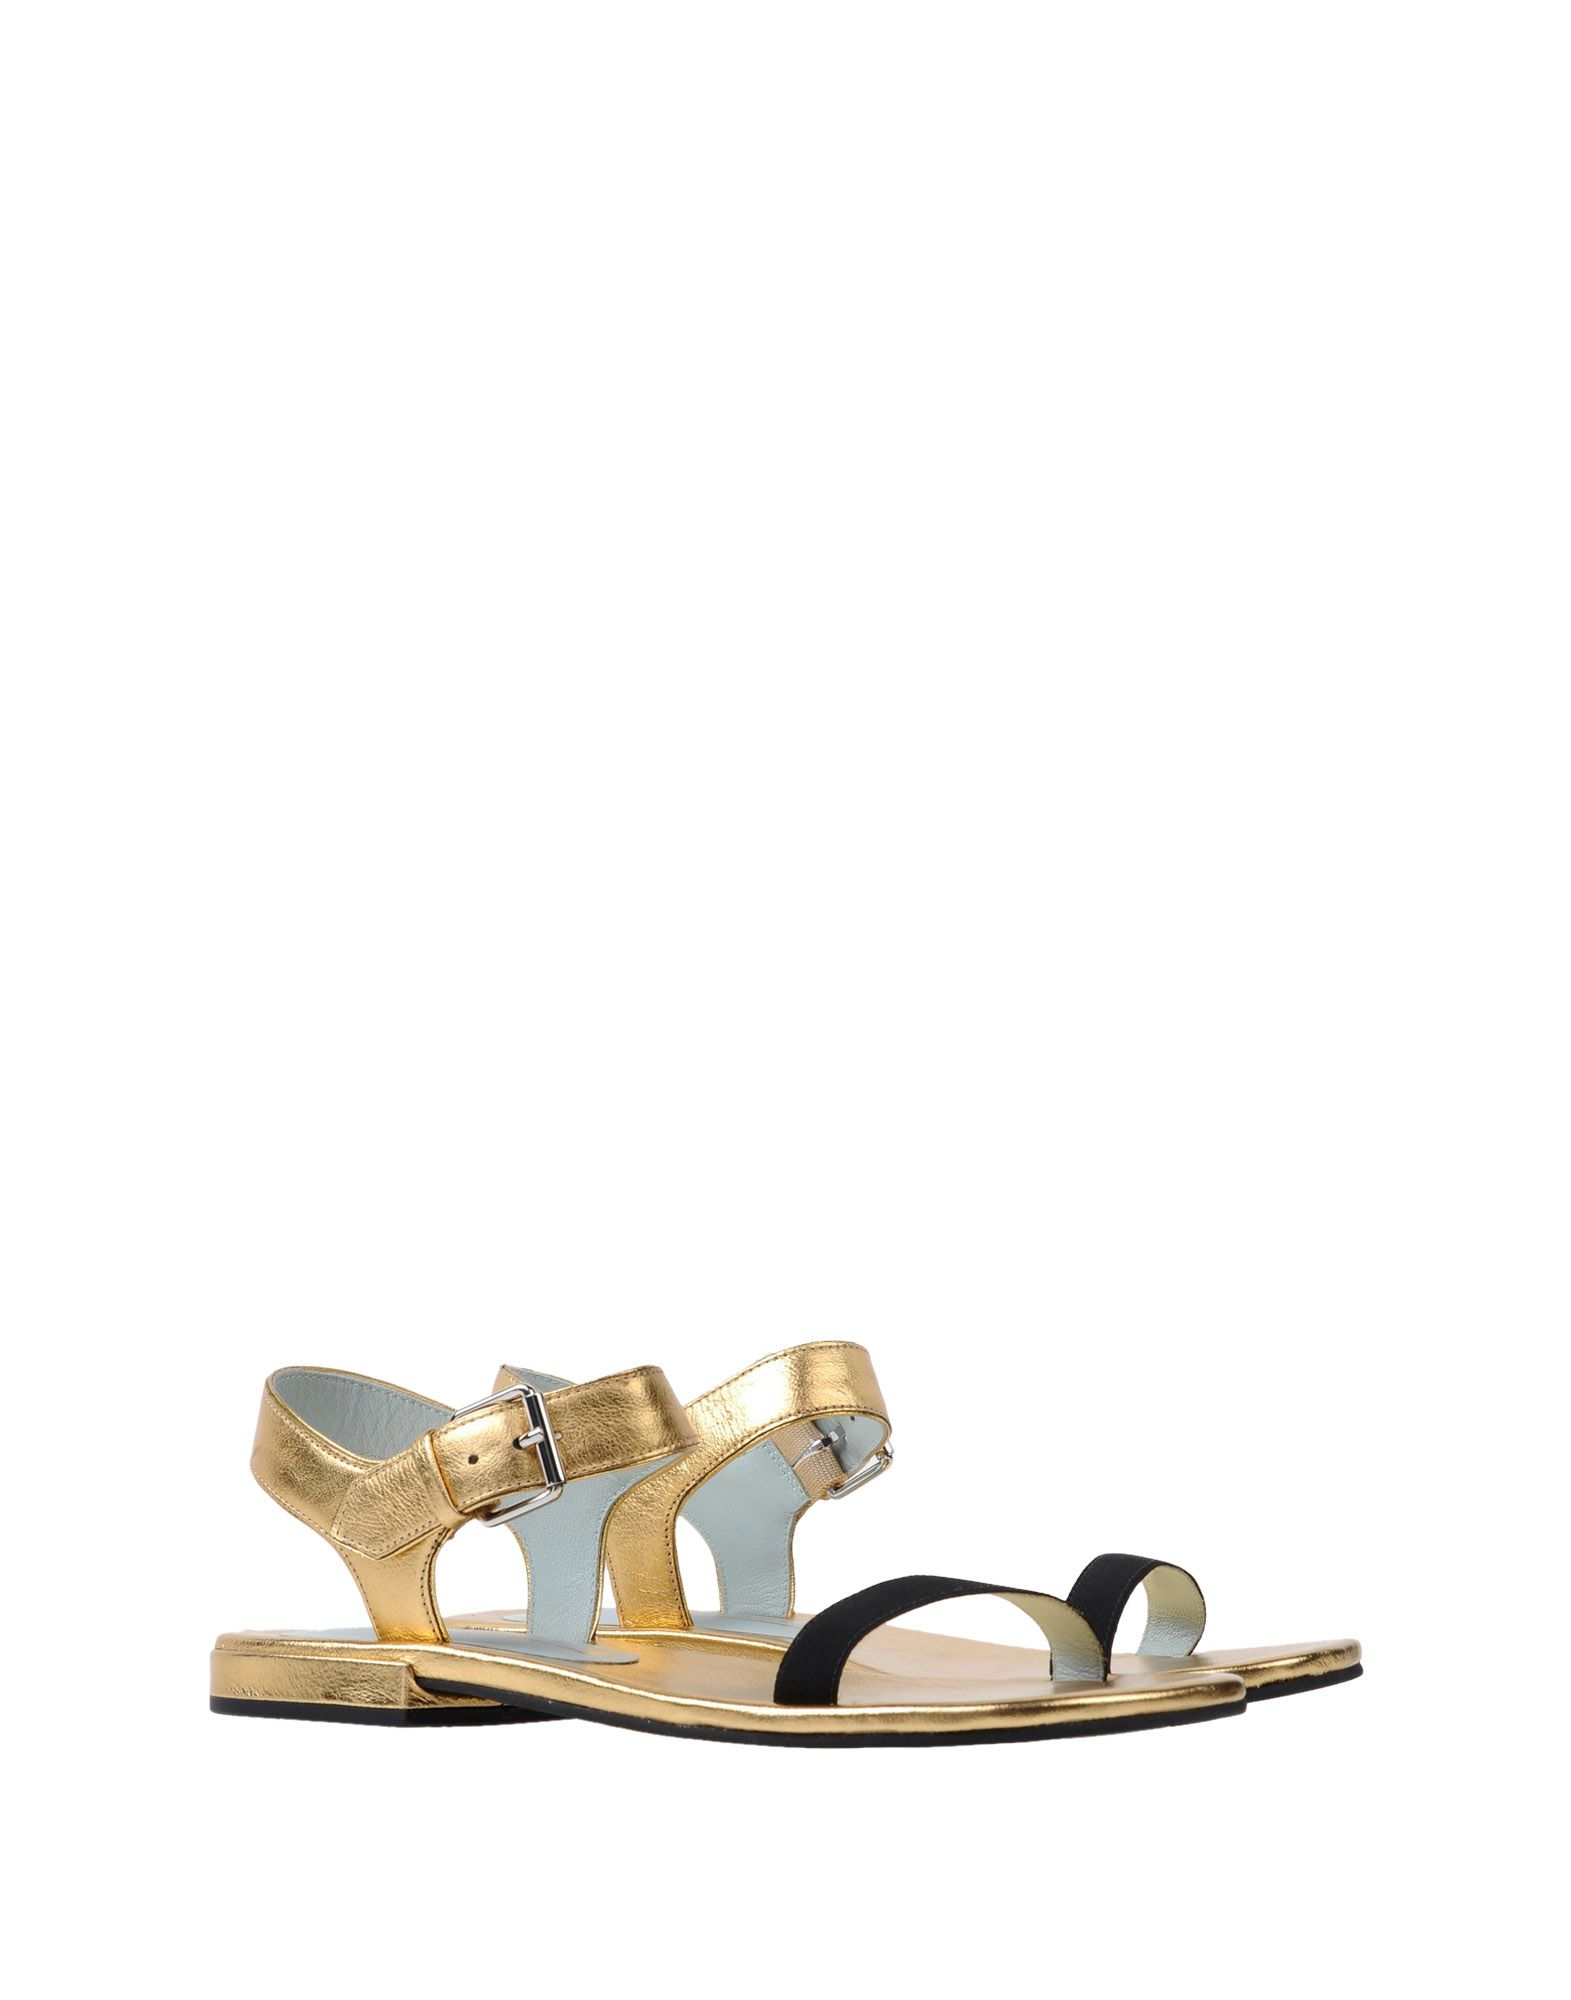 Marc Jacobs Sandalen Damen  11381058VHGut aussehende aussehende aussehende strapazierfähige Schuhe 81035c